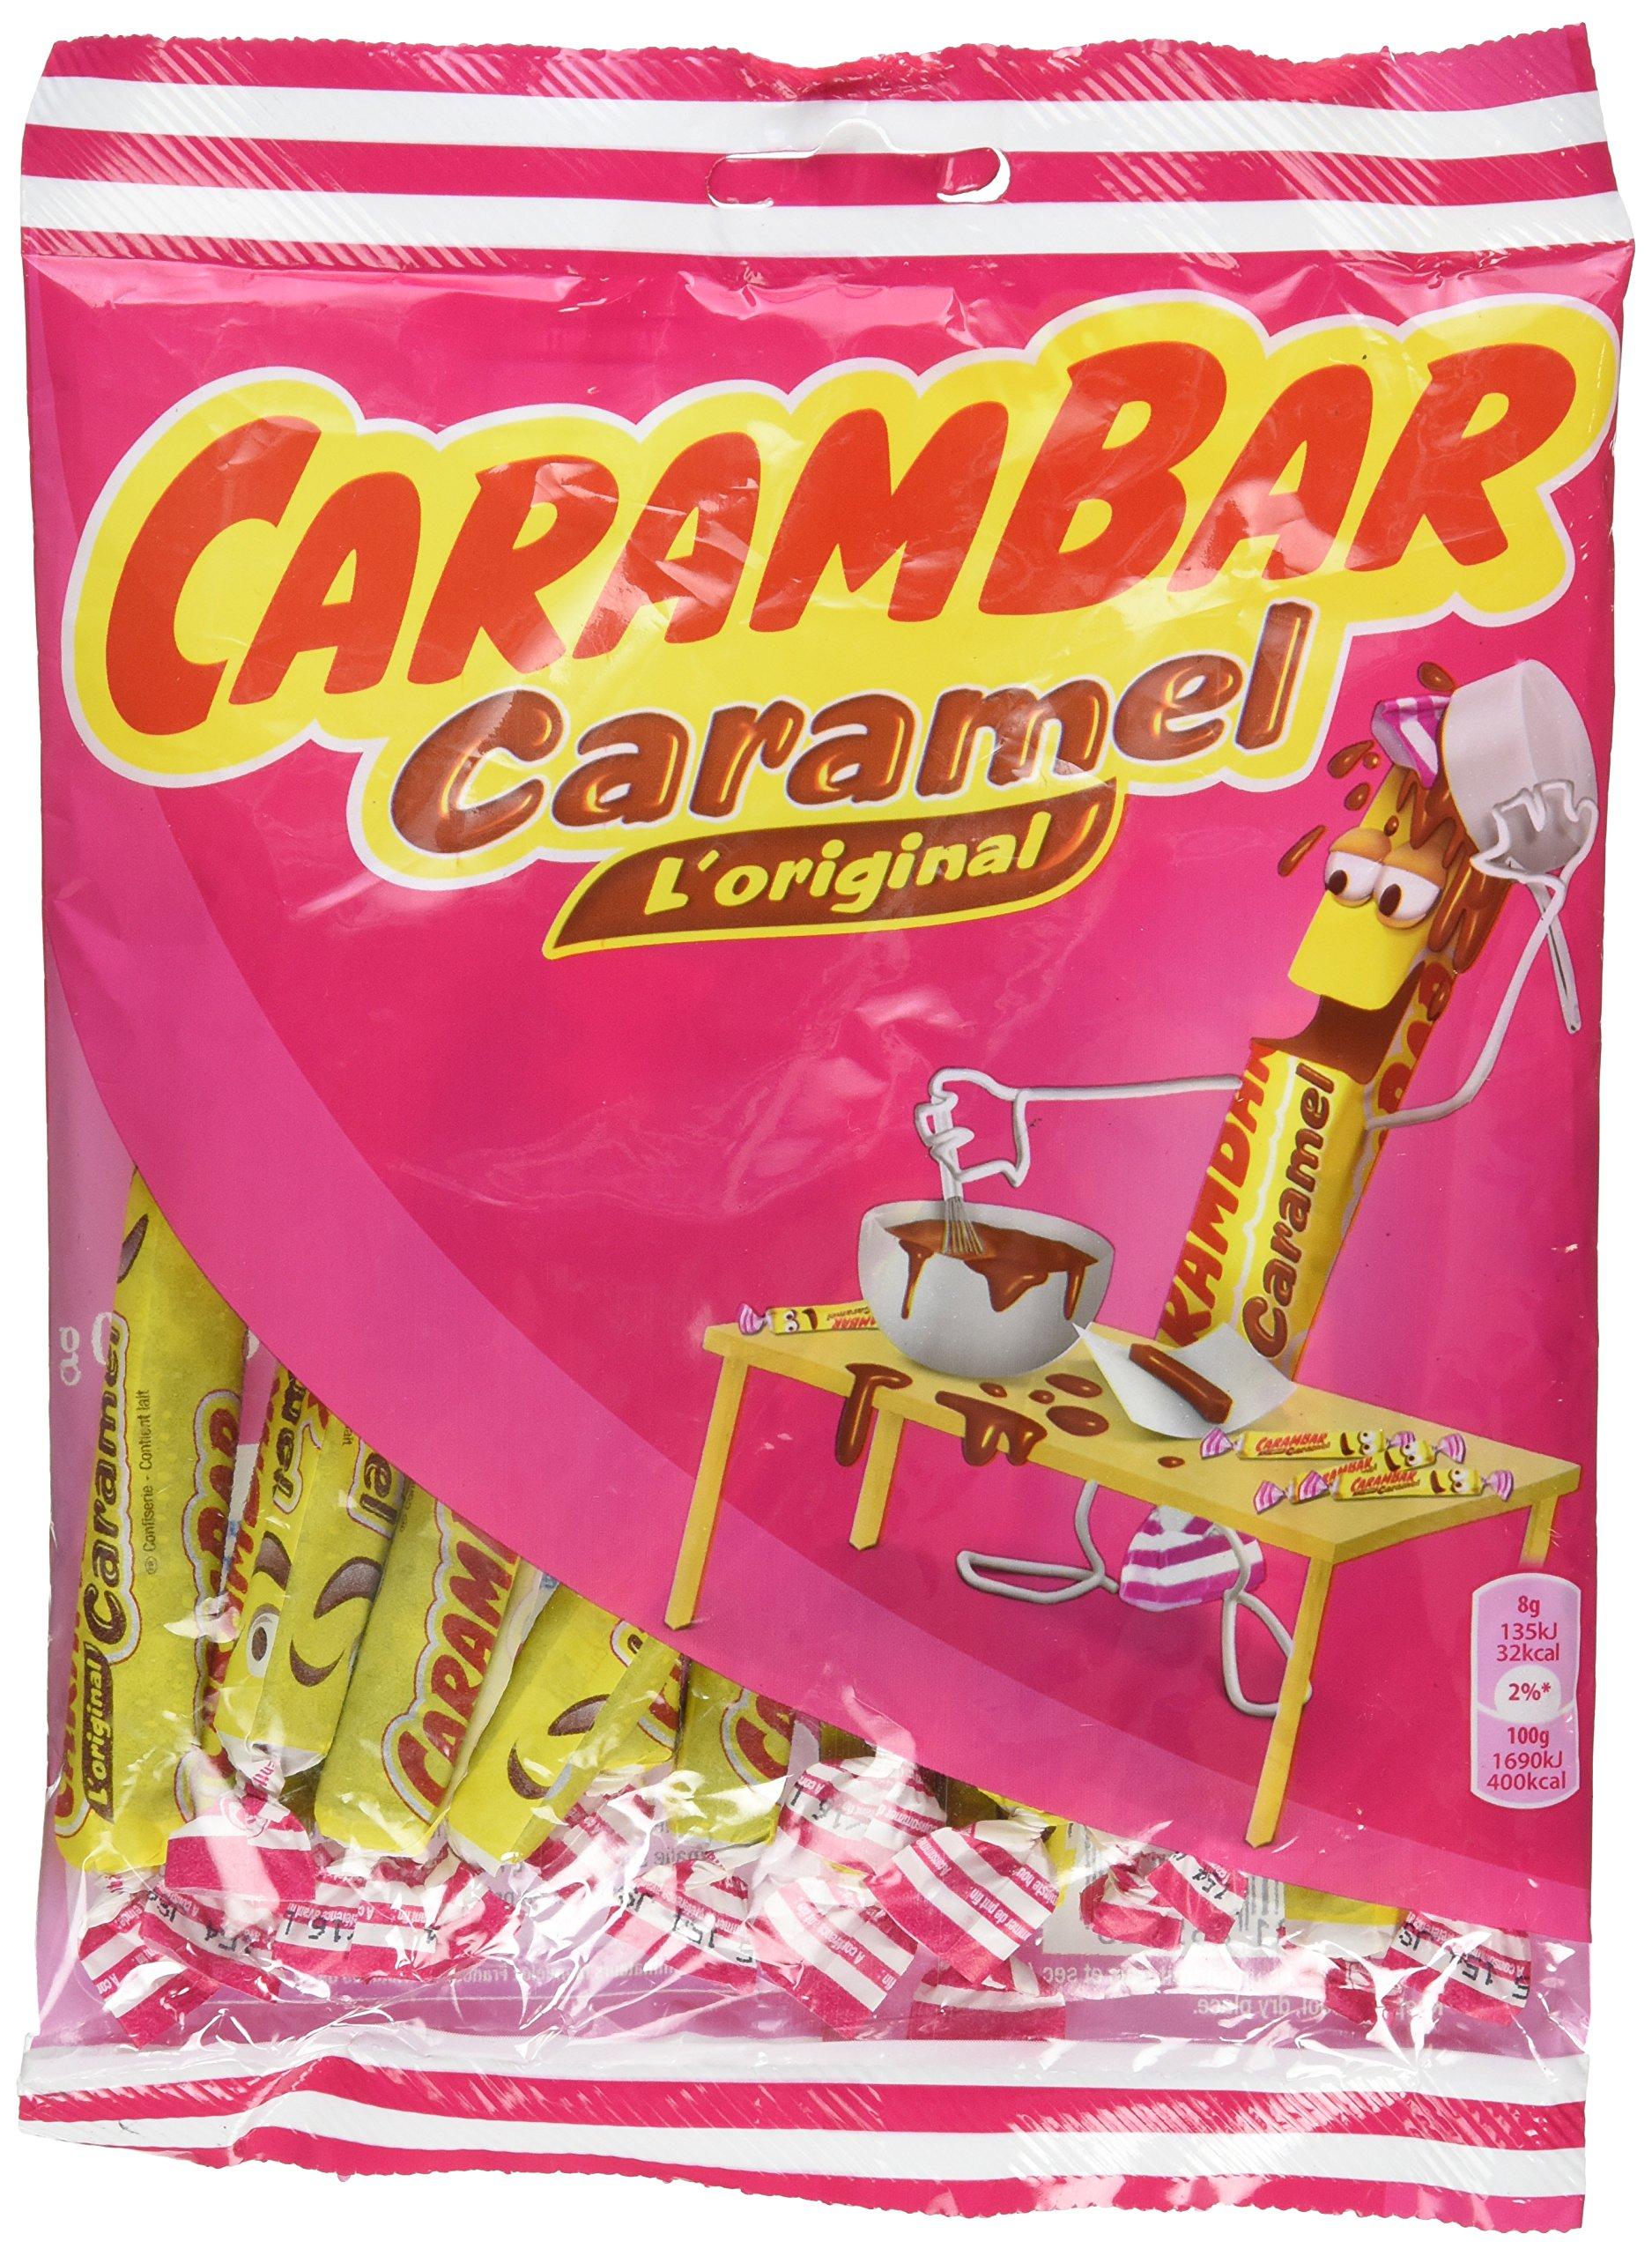 Carambar Candy in A Bag 130g (0.3 oz), One by La Pie qui Chante